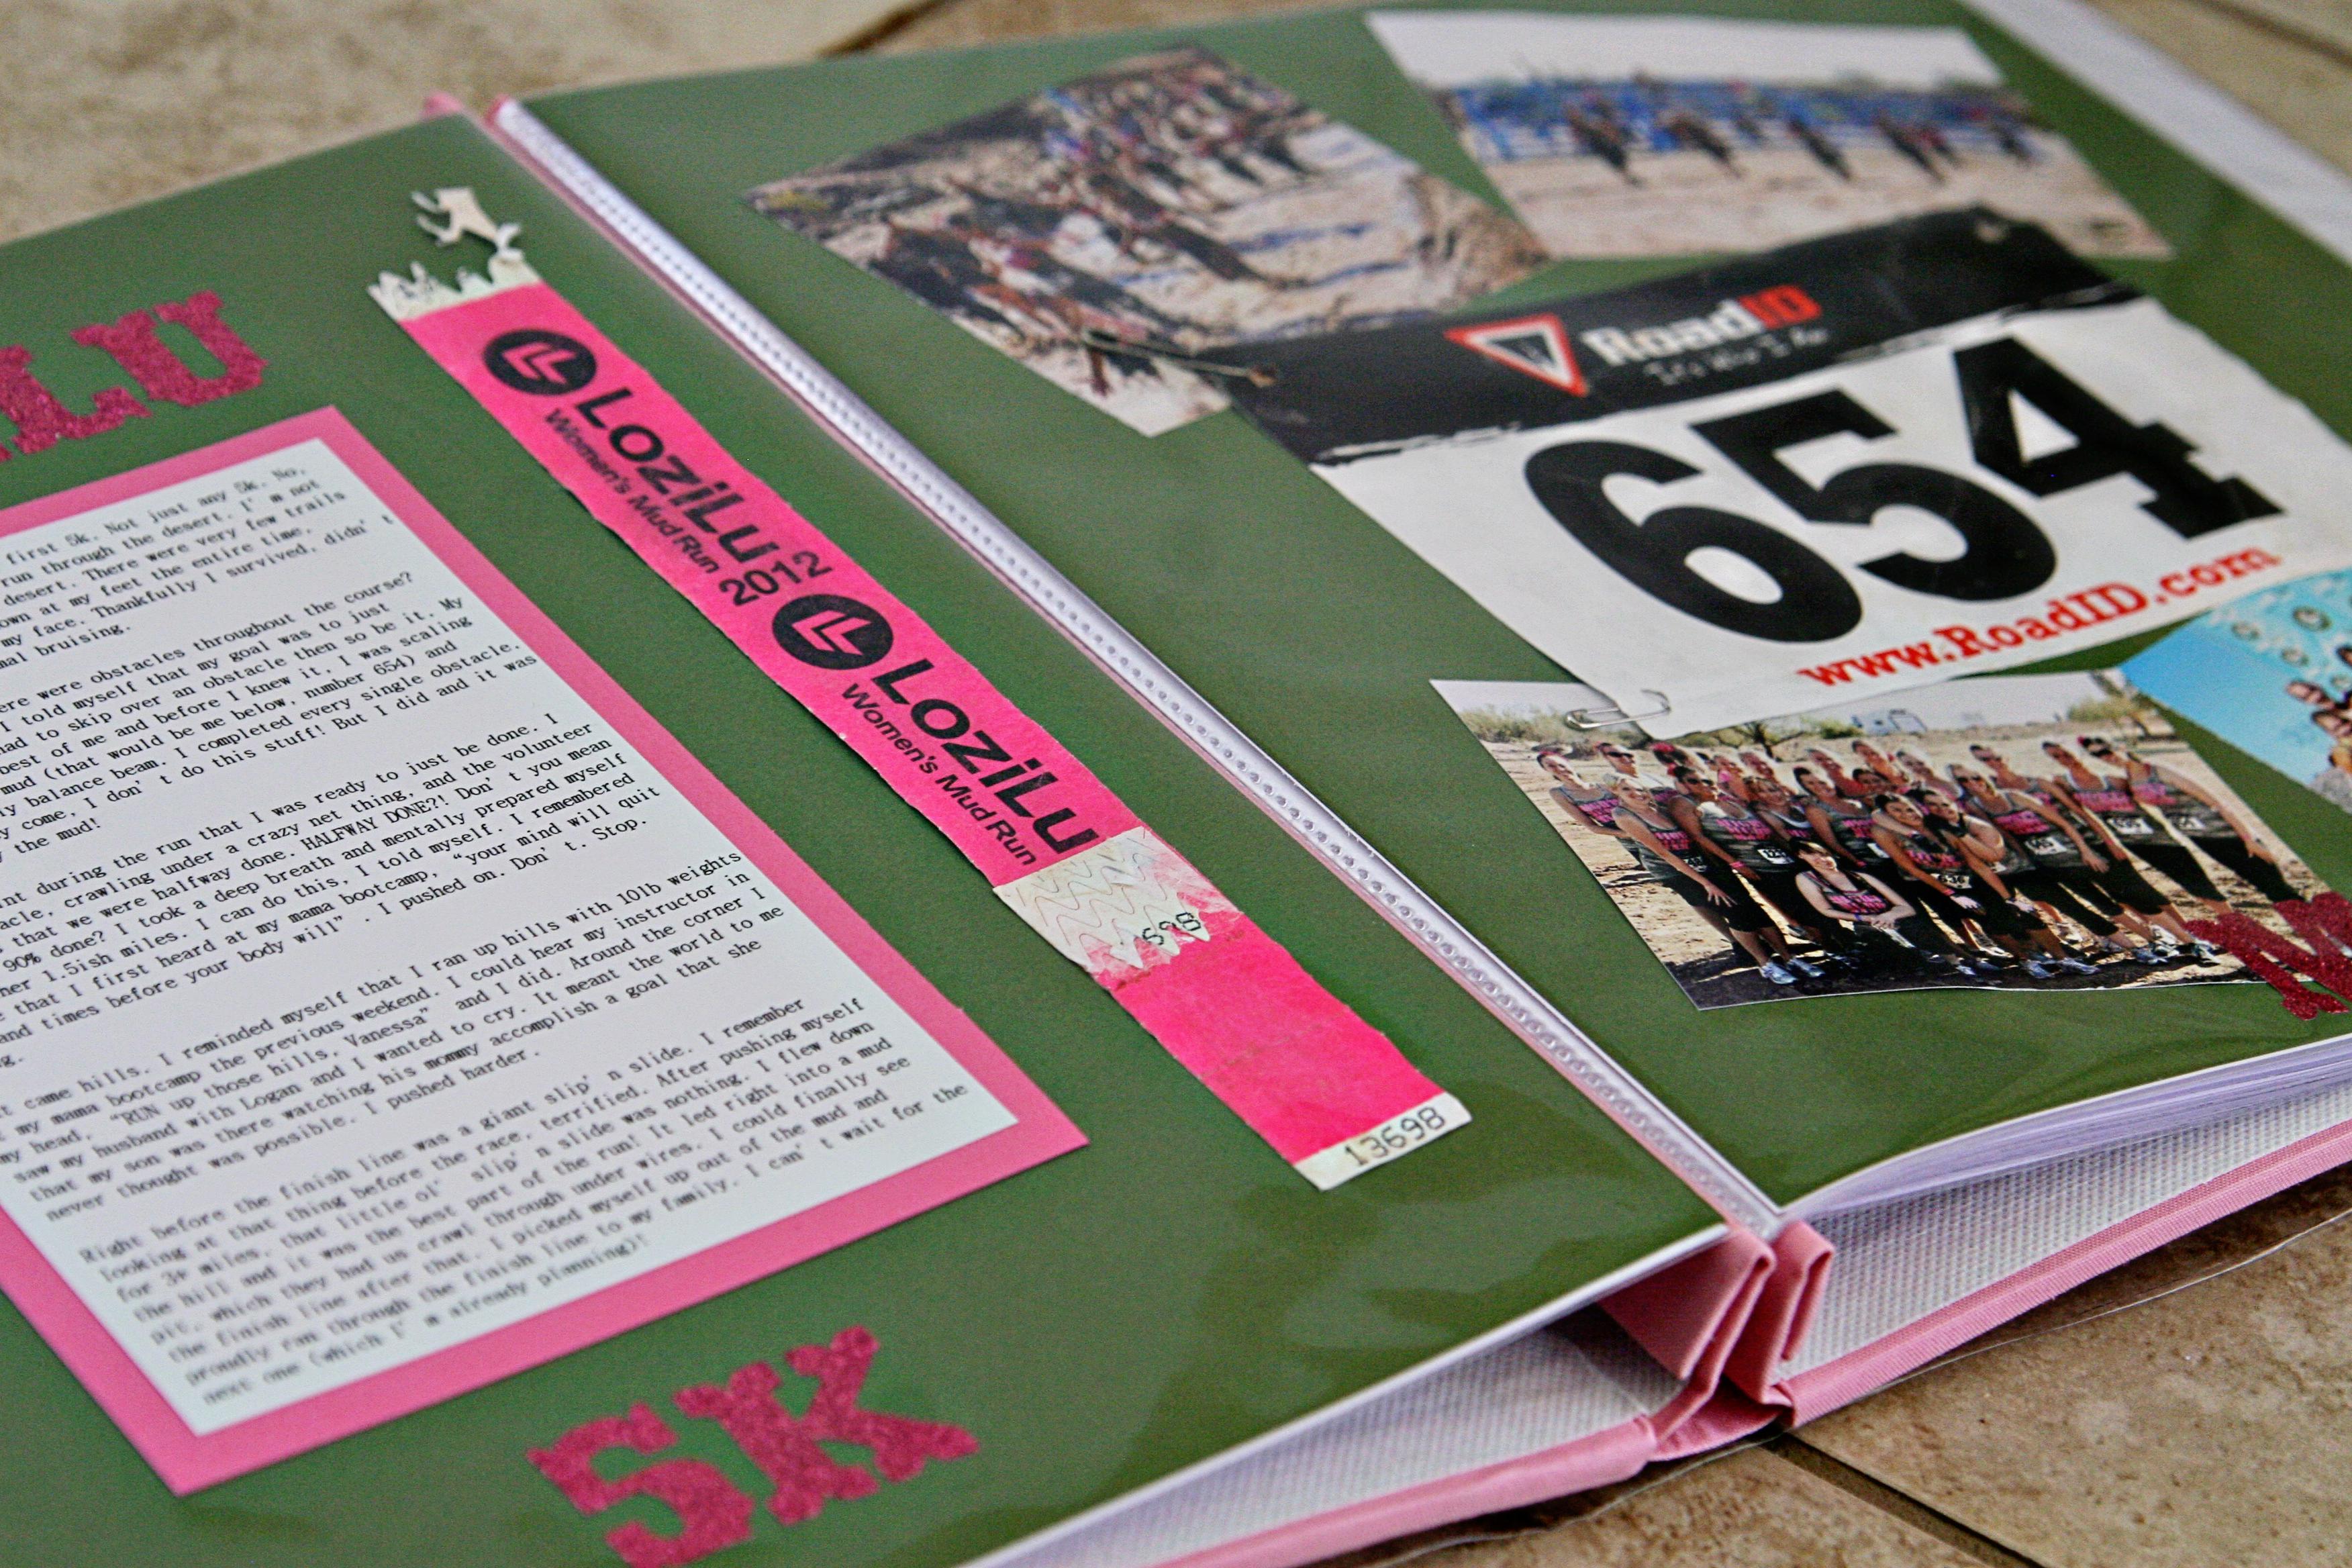 Running scrapbook ideas - And